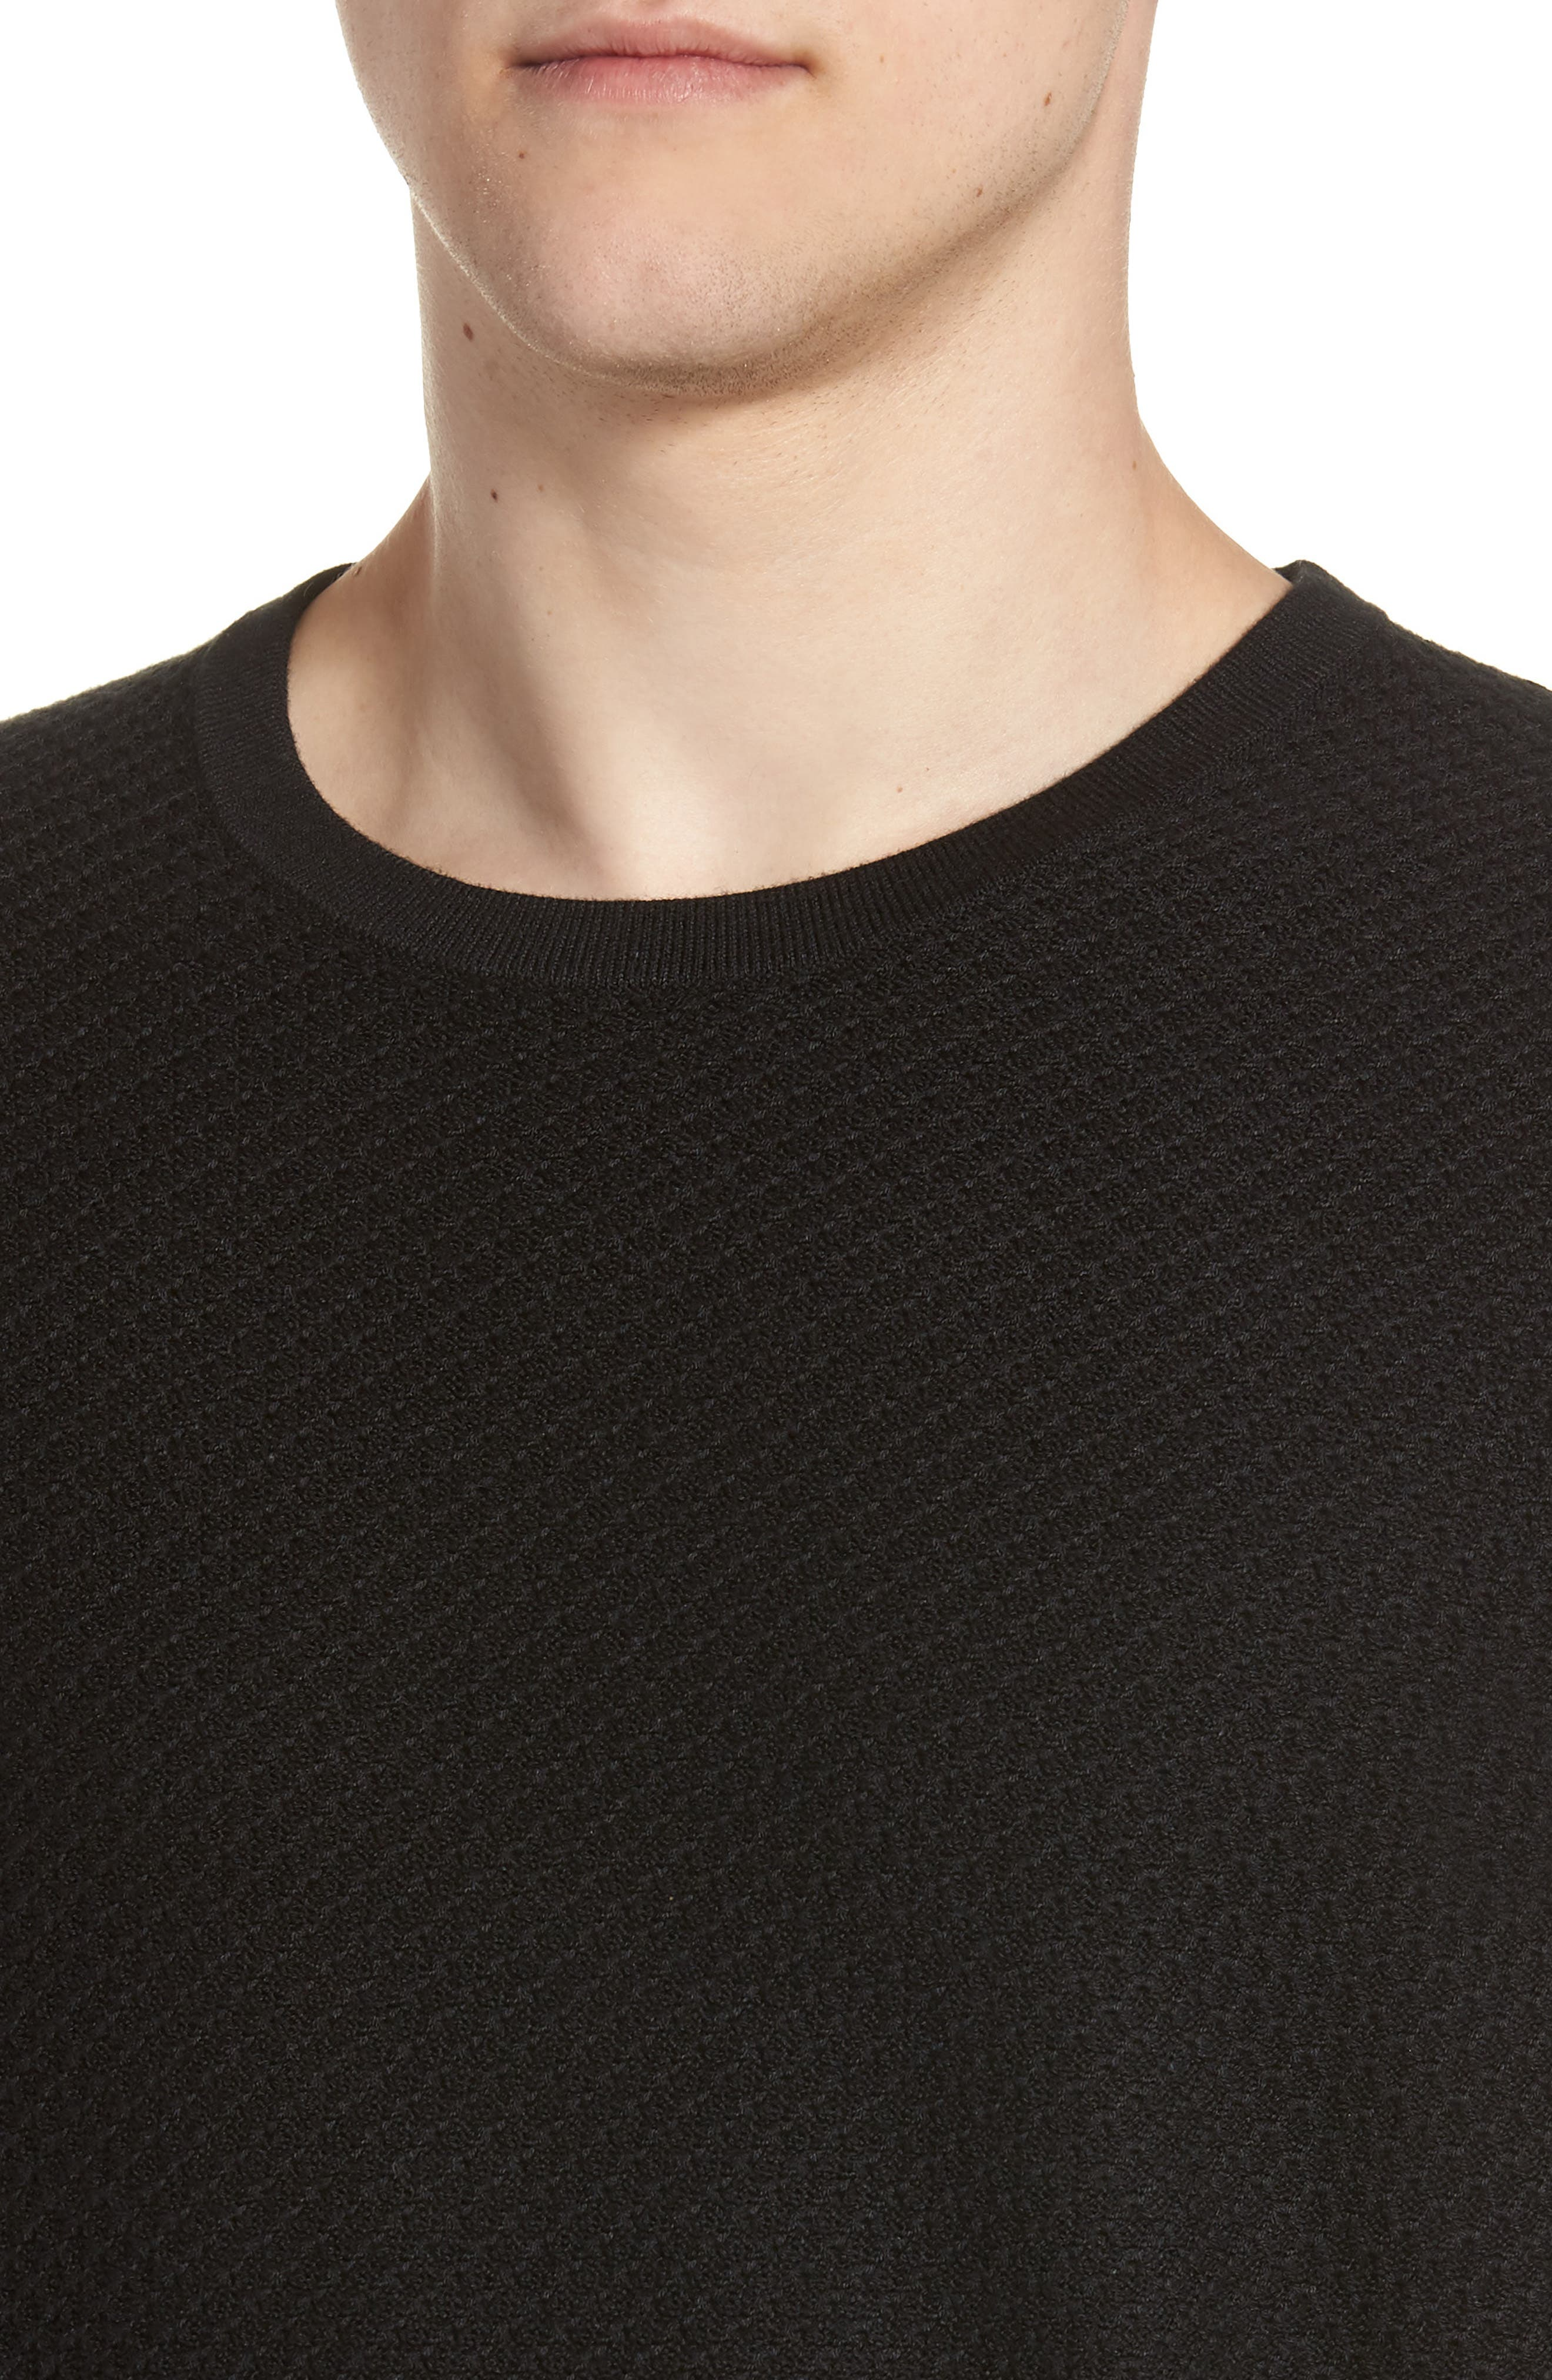 Honeycomb Crewneck Sweater,                             Alternate thumbnail 4, color,                             001